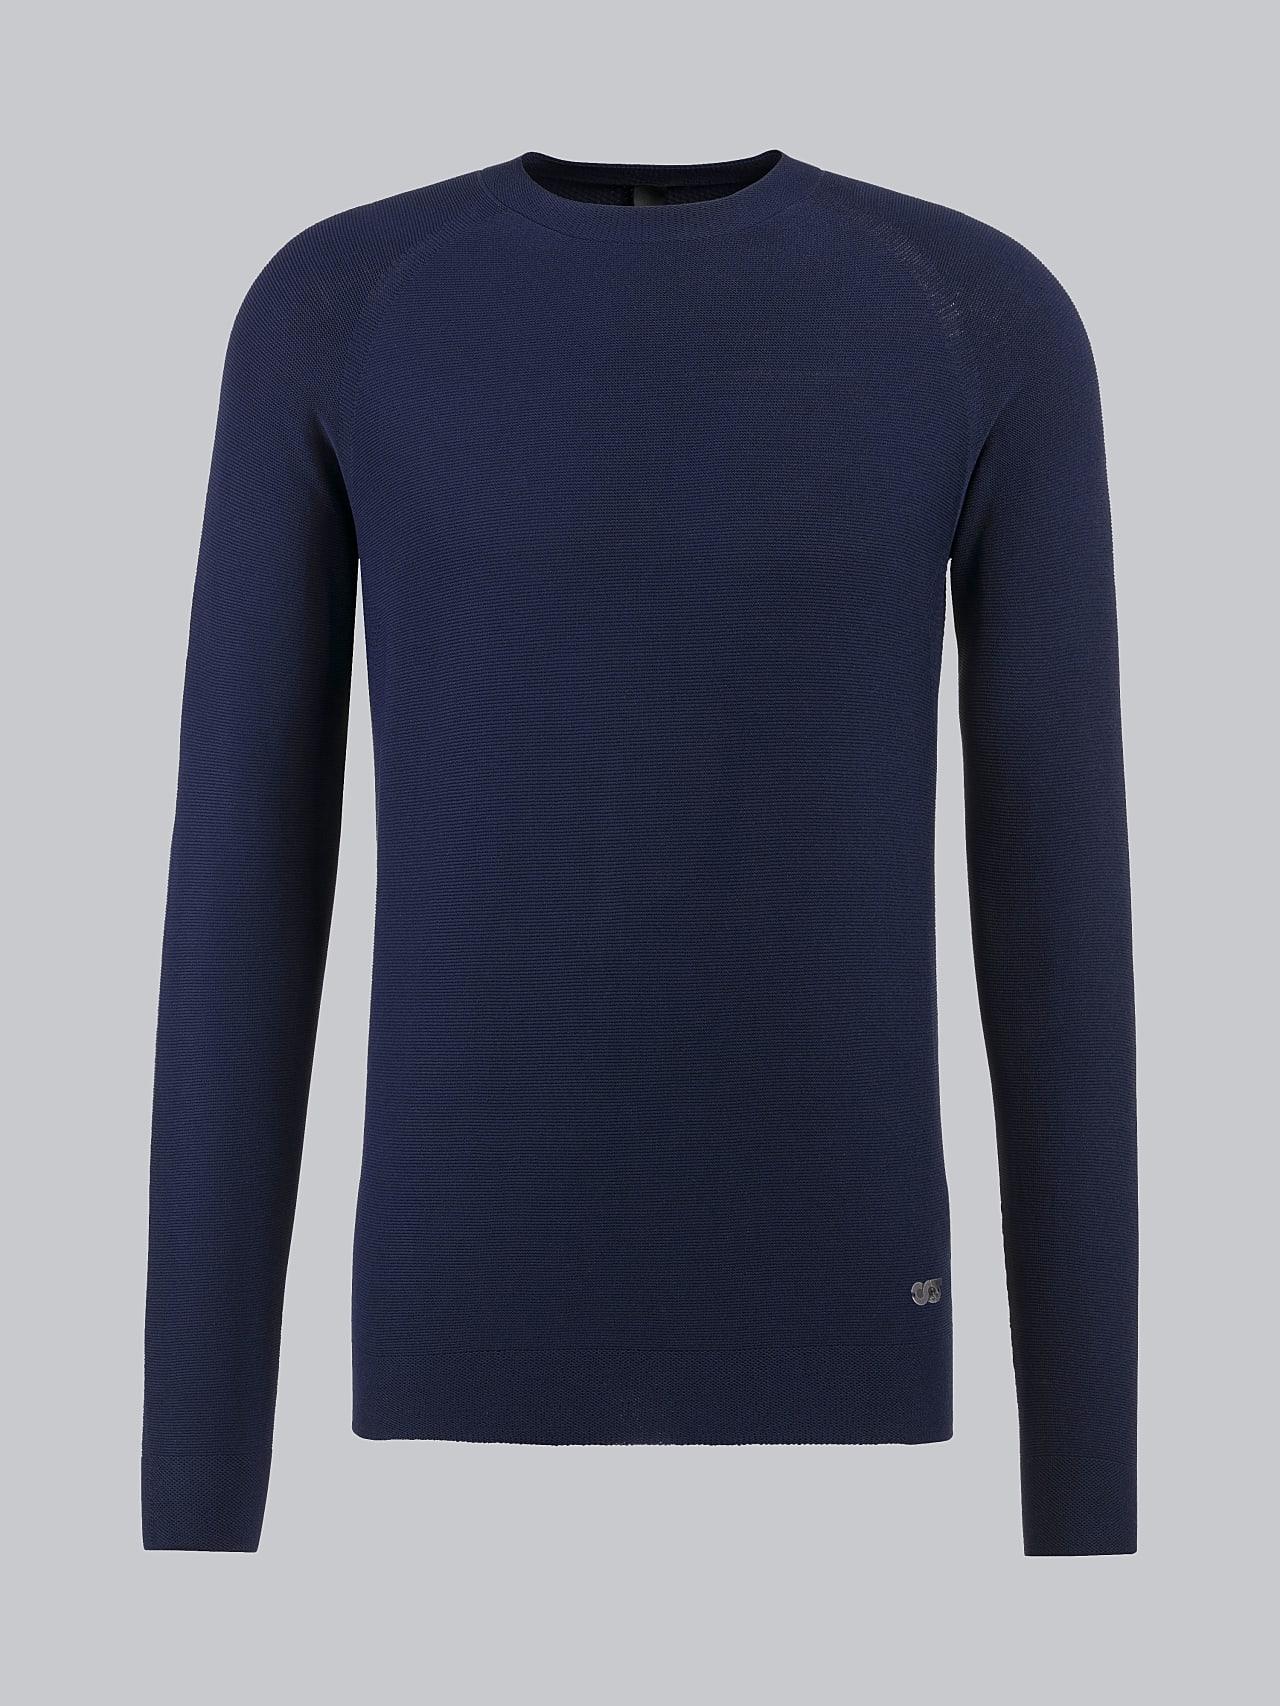 FOSOP V3.Y4.02 Seamless Knit Sweater navy Back Alpha Tauri